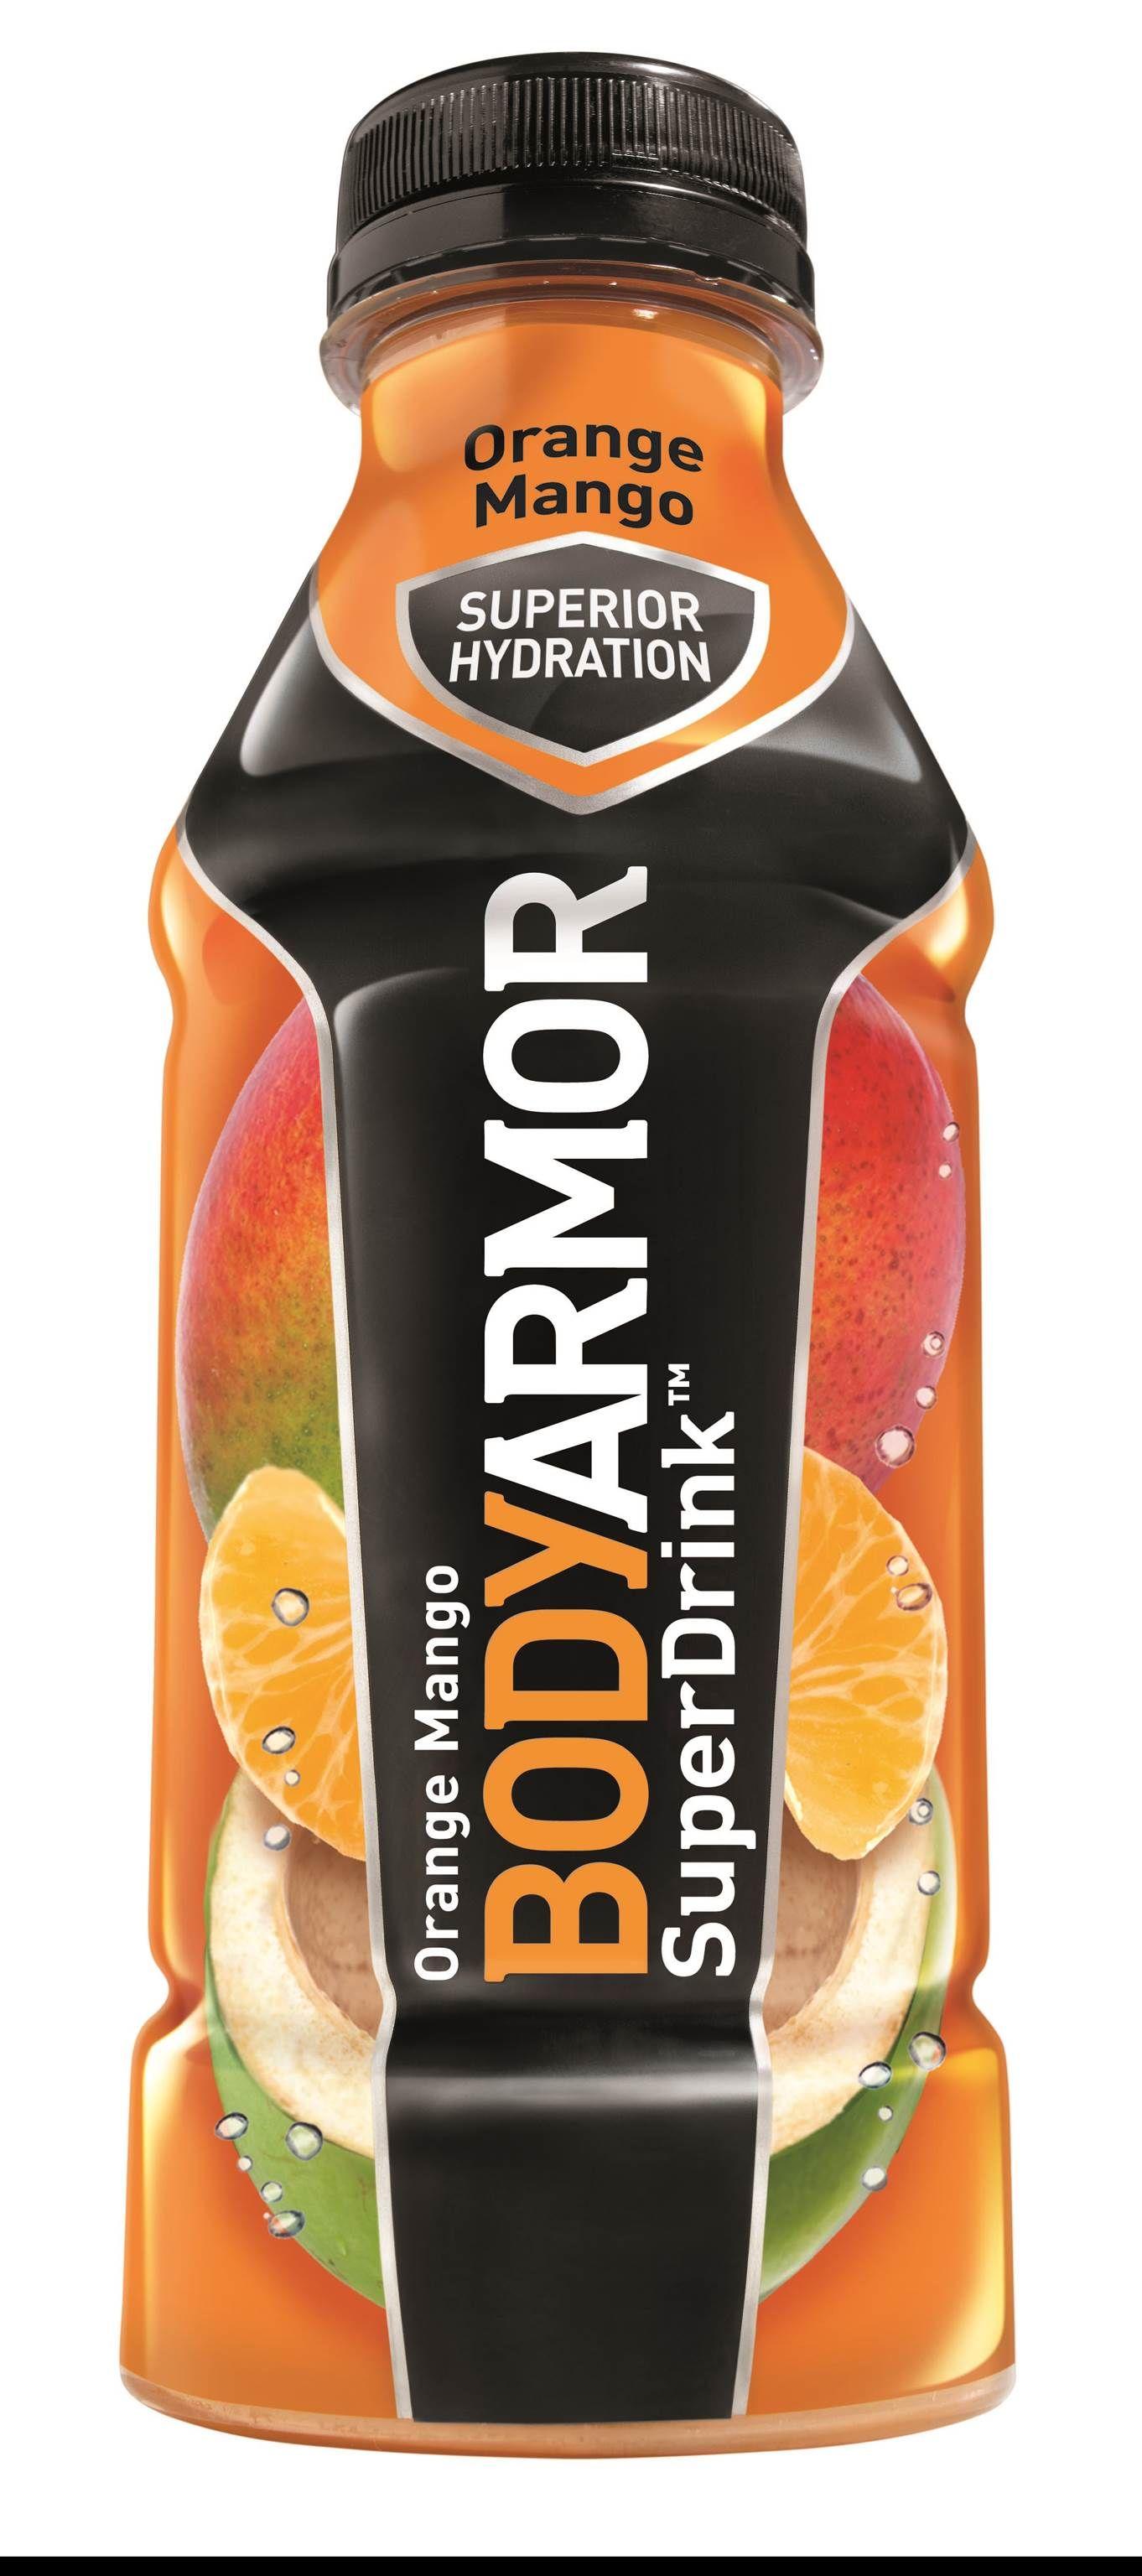 Orange Mango BODYARMOR Natural SportsDrink Sports